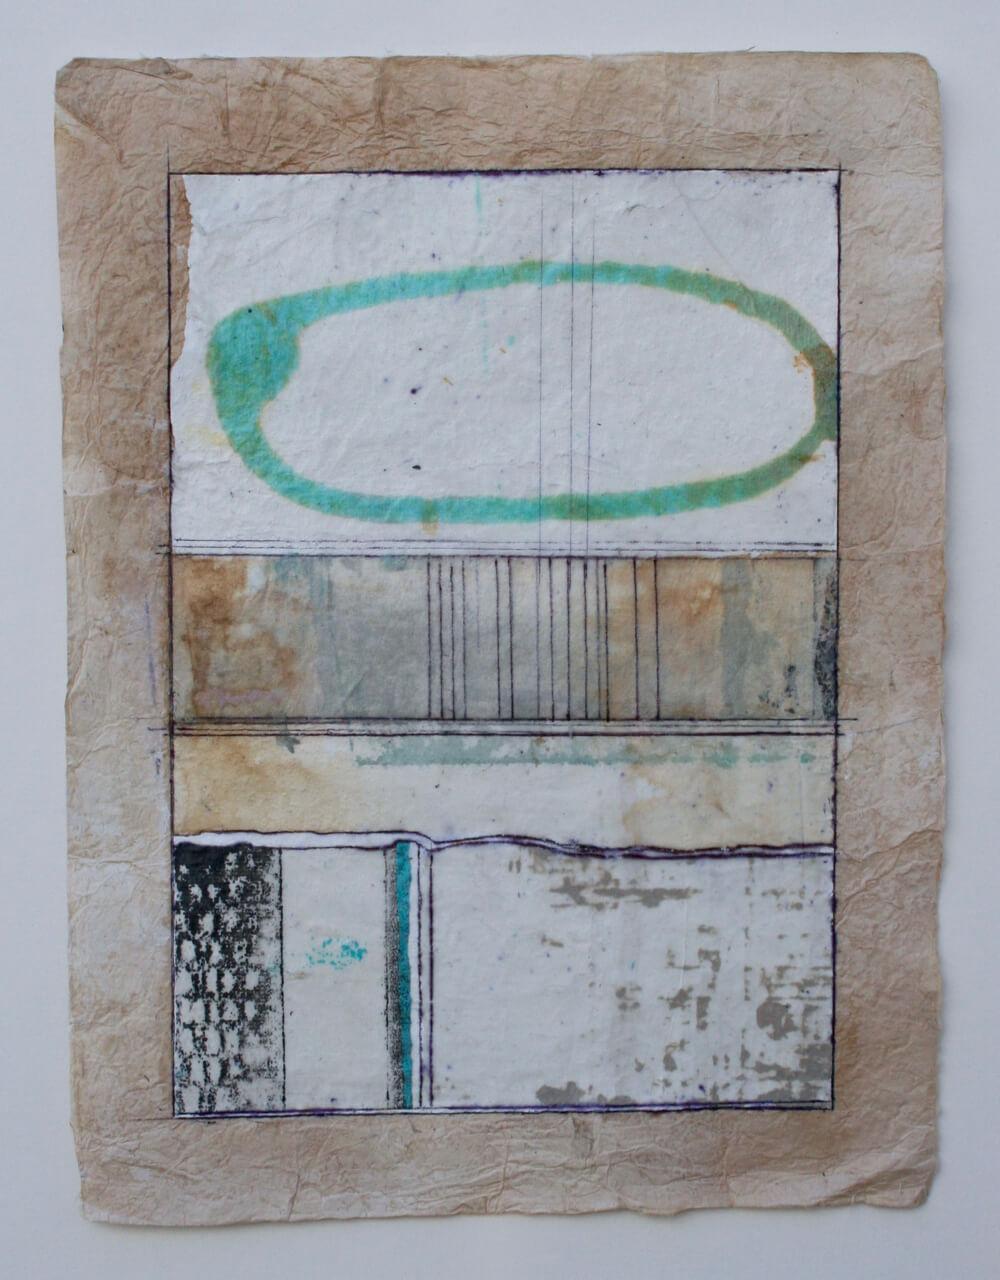 keys series  'ellipse'  mixed media on paper  12 x 9  sold  .  .